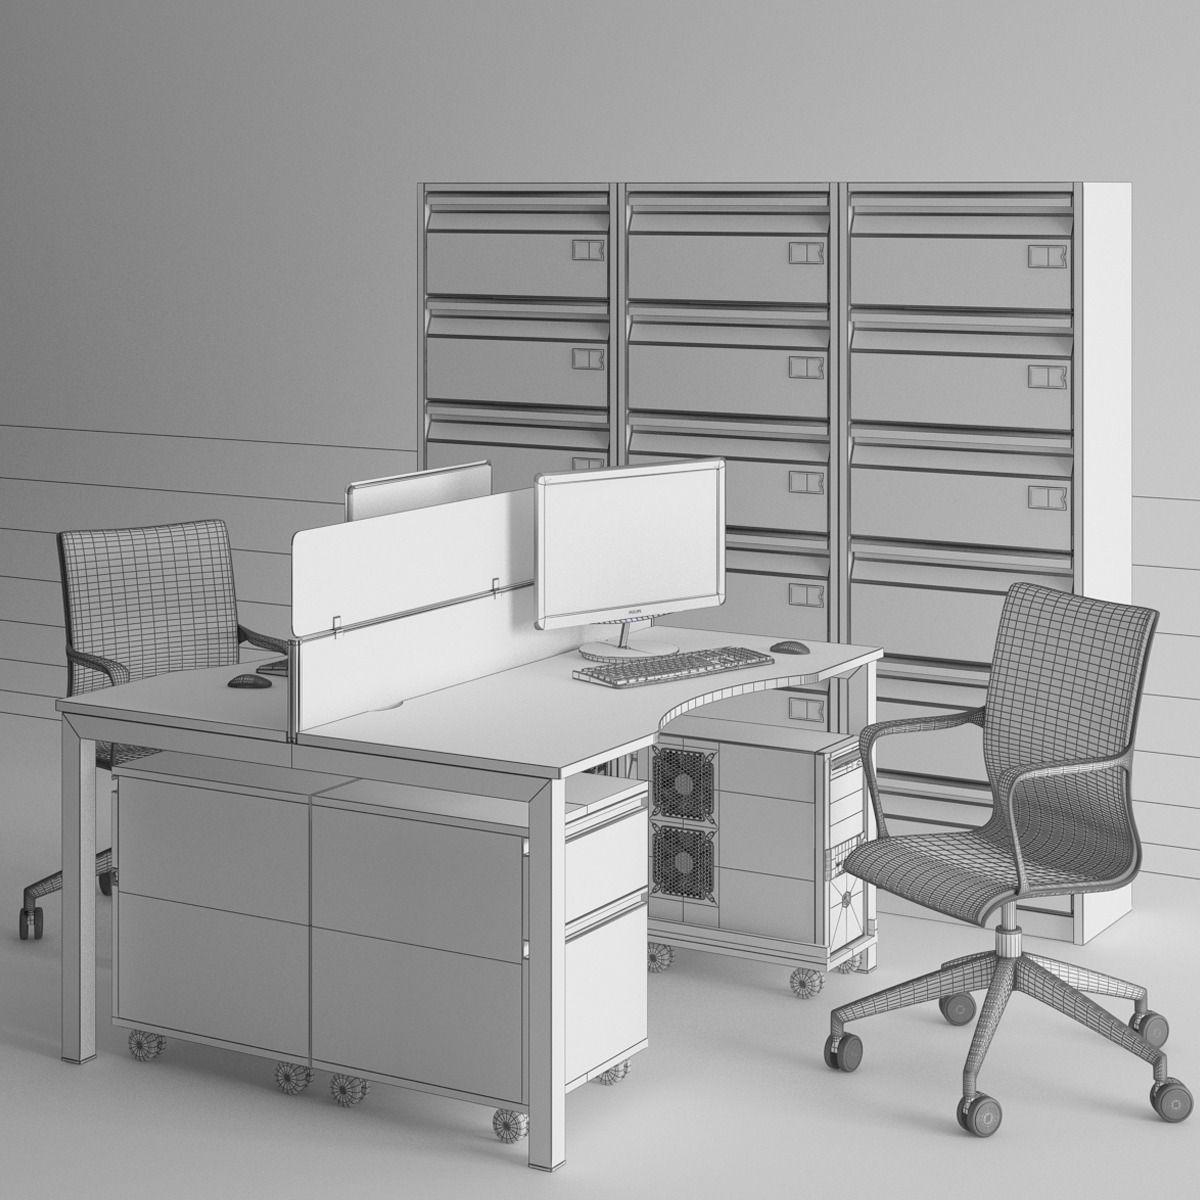 fice Furniture 3D Model MAX